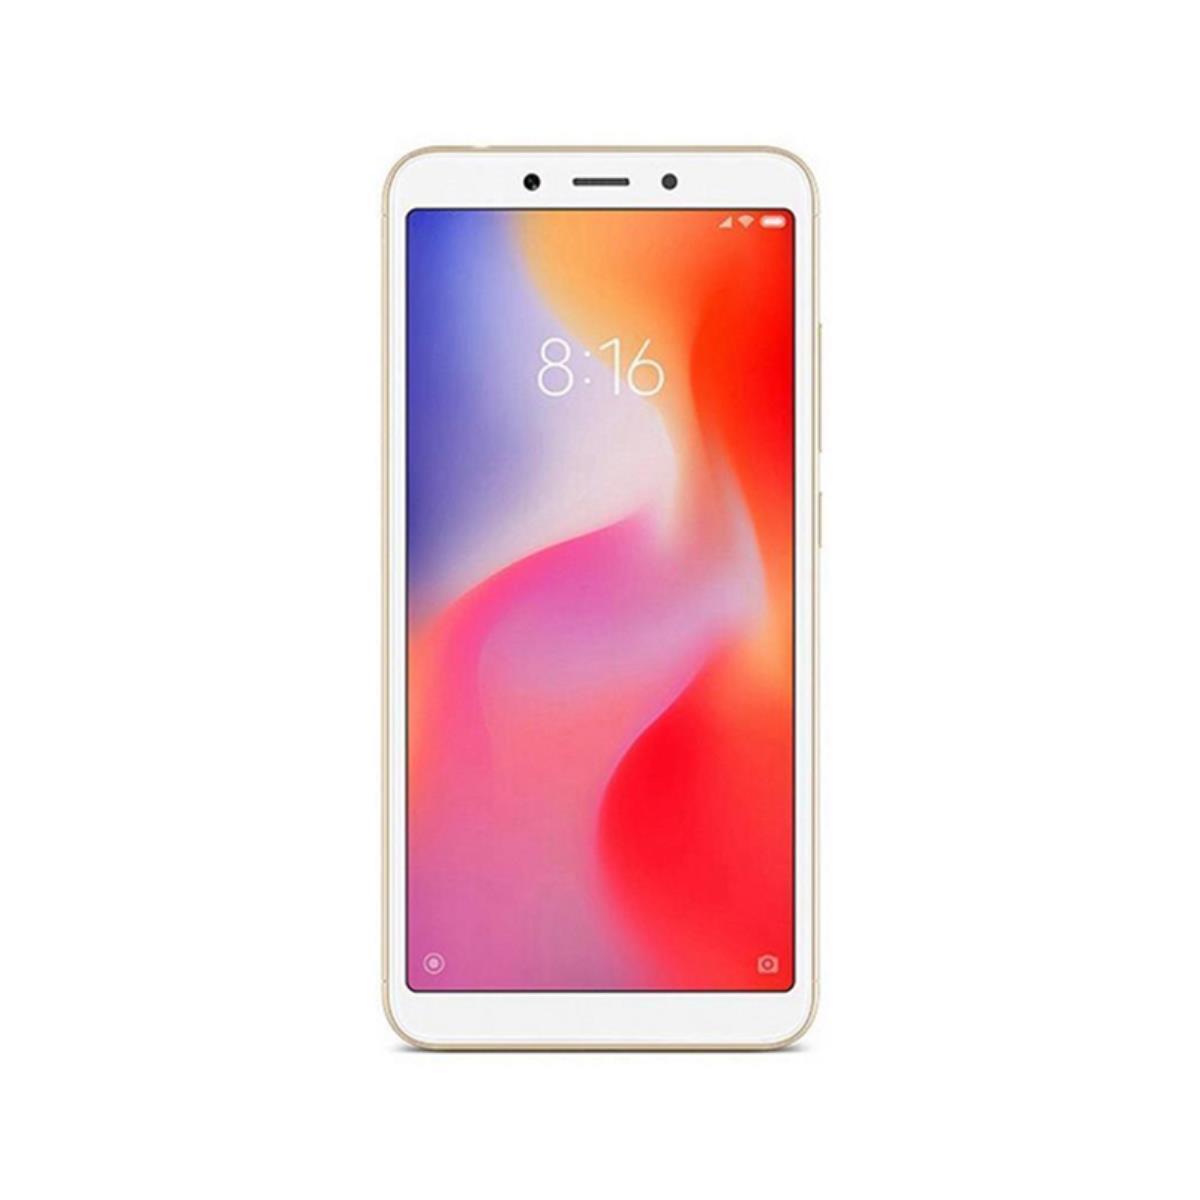 "Smartphone Huawei Y5 2018 5.45"" 16GB Dual SIM Black"